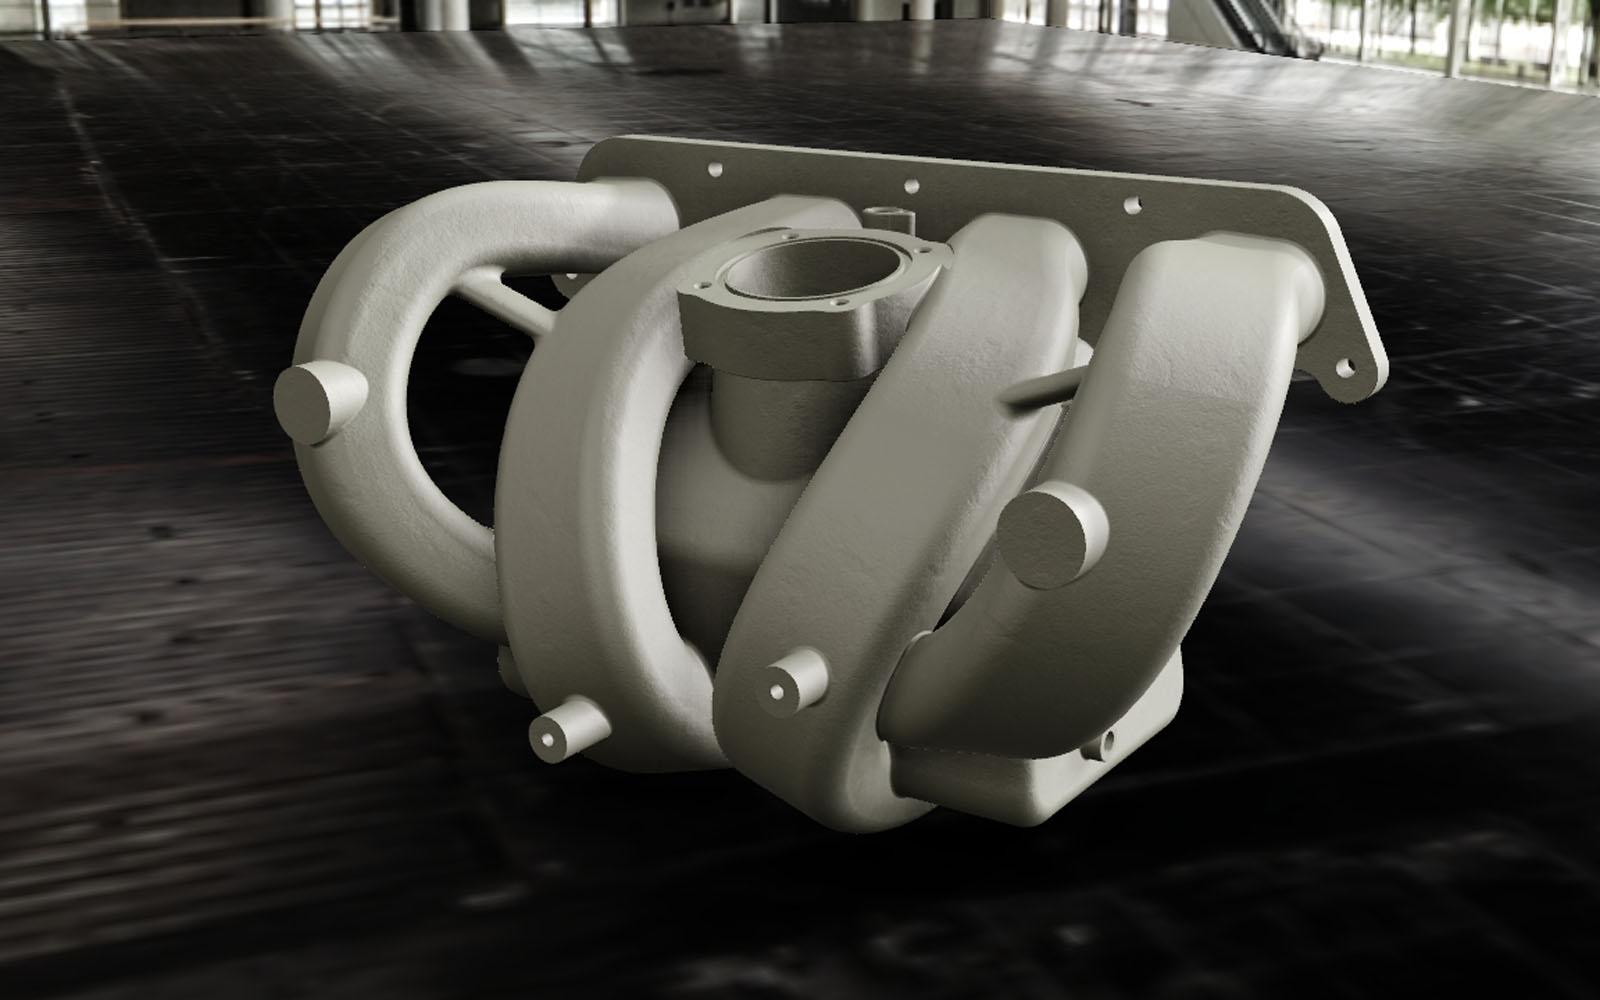 Conap CAD Konstruktionsbüro - CAD Modell eines Saugsystems